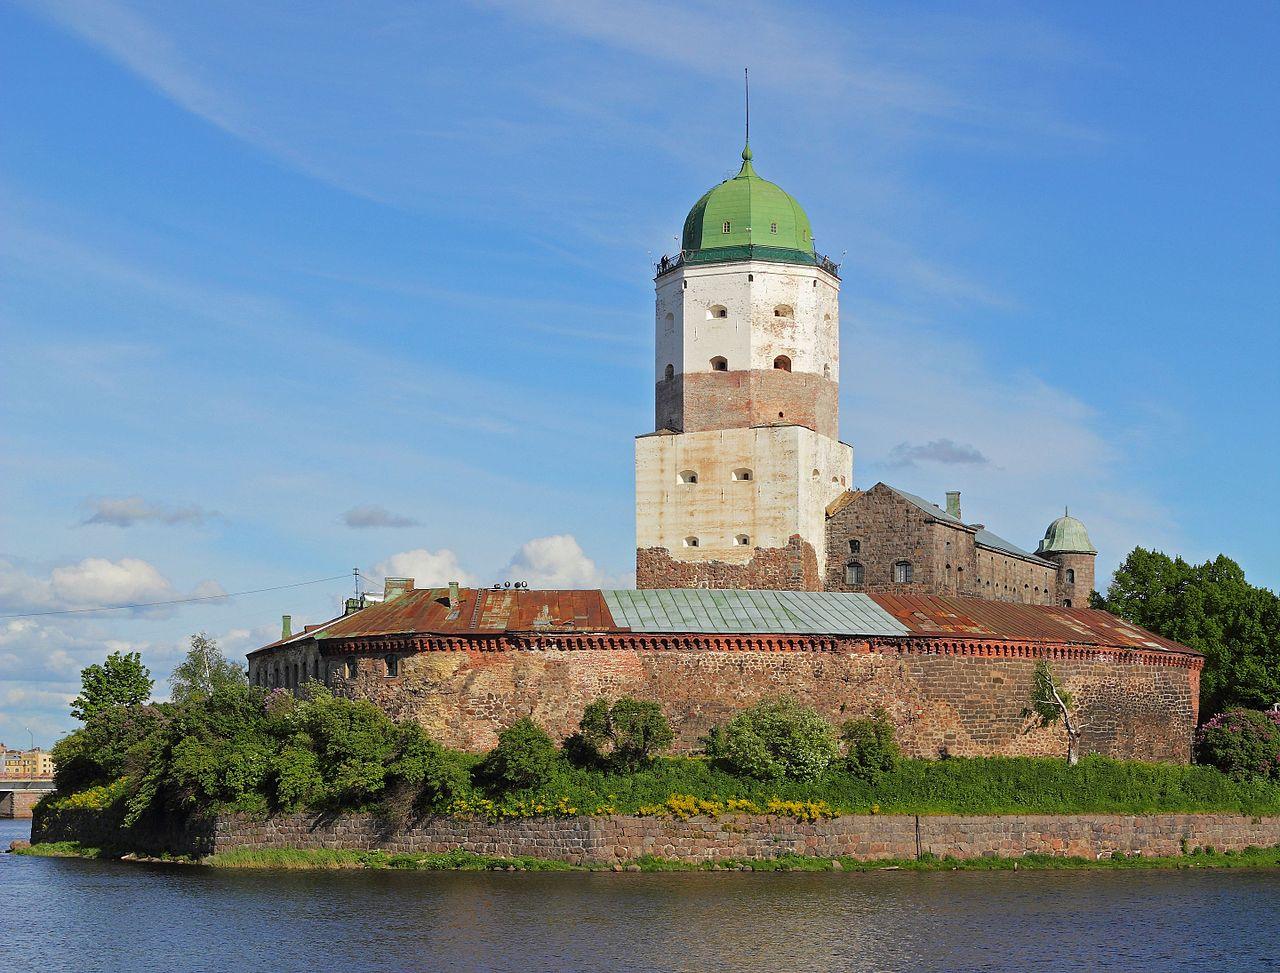 Выборгский замок. Башня Святого Олафа. Автор фото: A.Savin (Wikimedia Commons · WikiPhotoSpace)